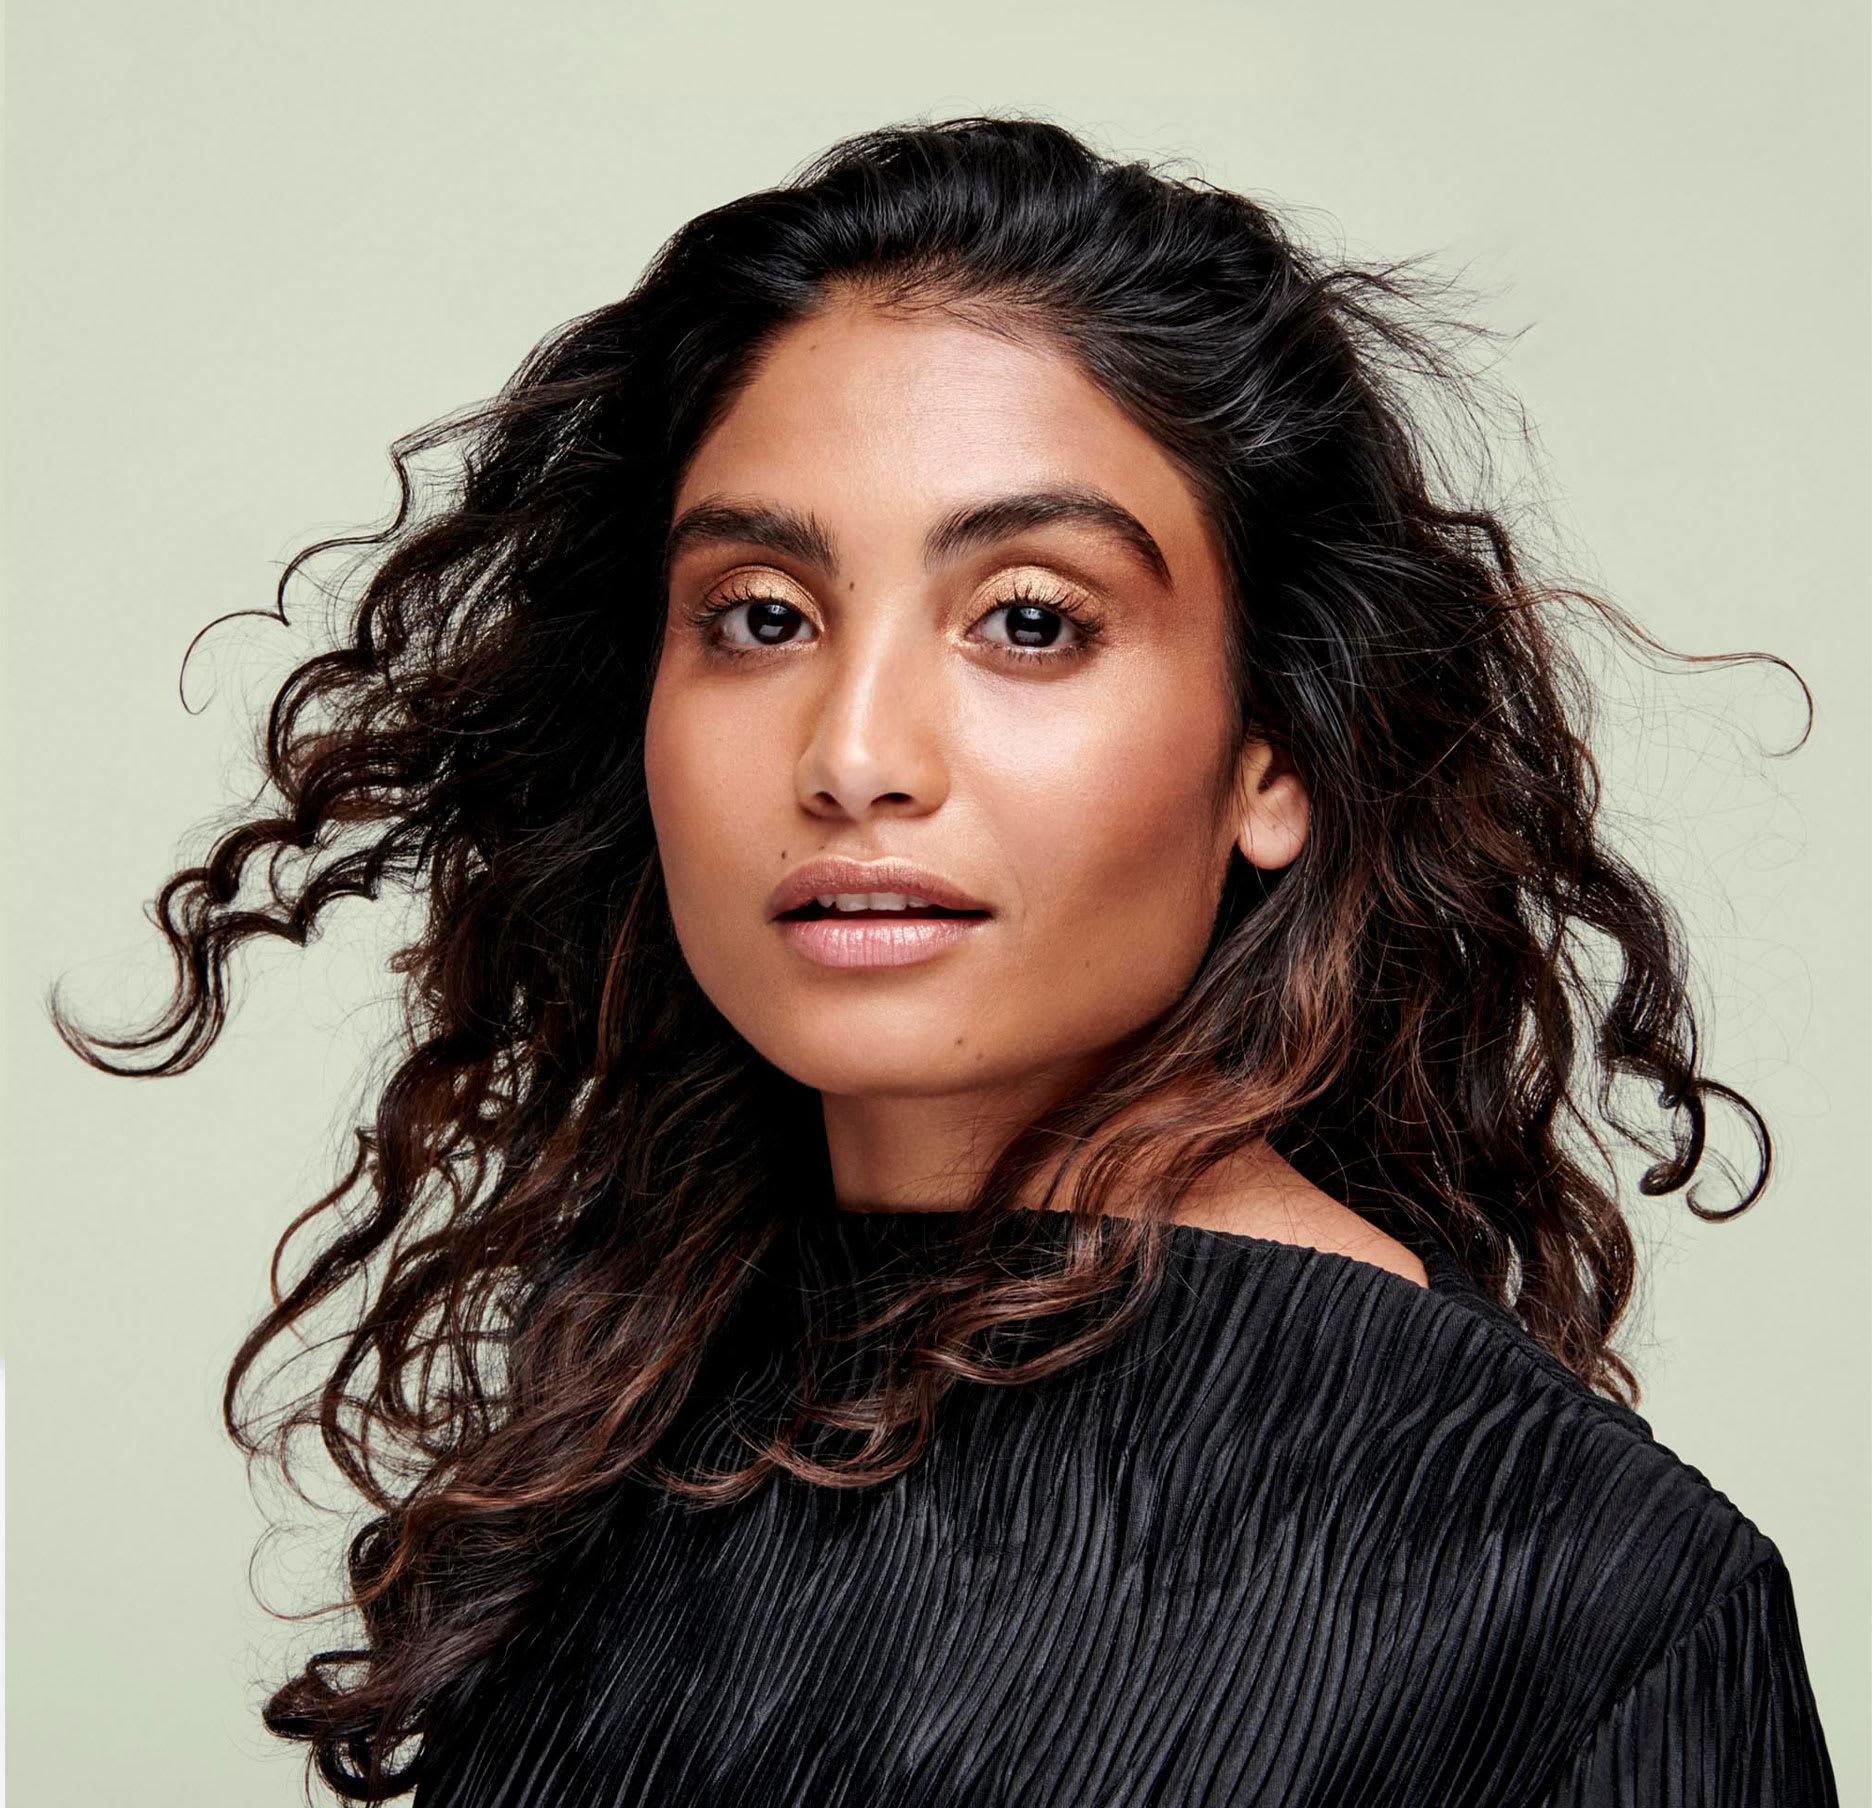 woman with dark brown wavy hair